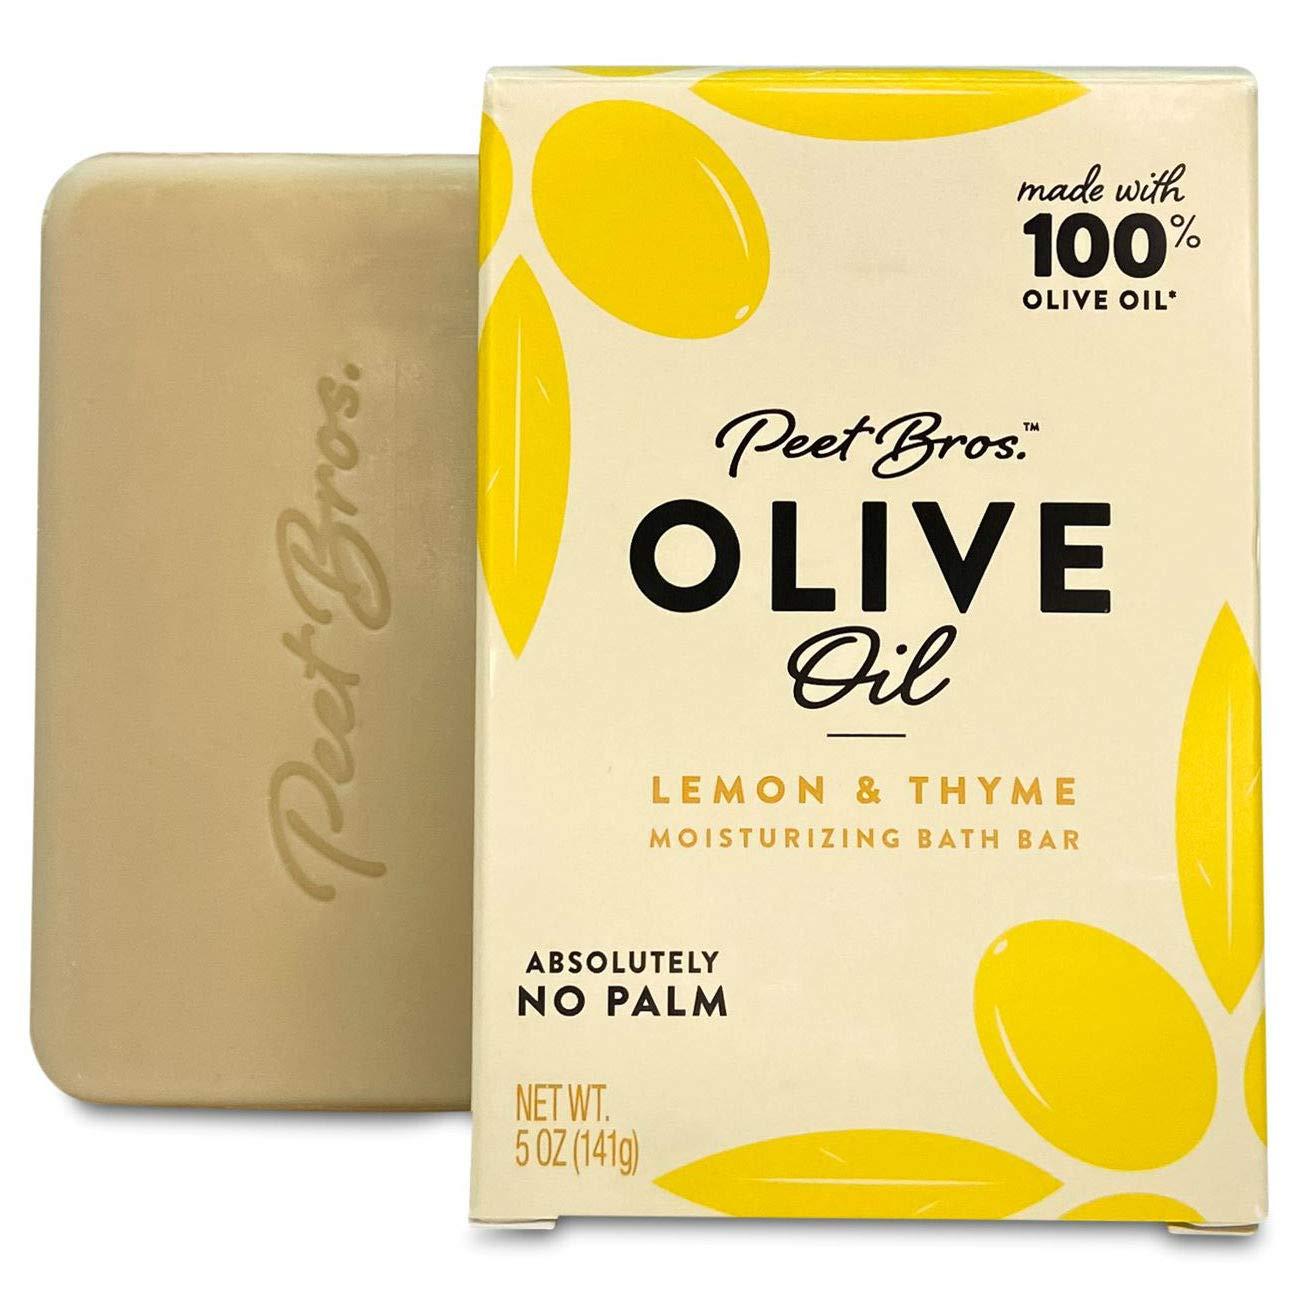 Peet Bros | Olive Oil Moisturizing Bath Soap Bar | Always Palm Oil-Free | 5 oz - Lemon & Thyme